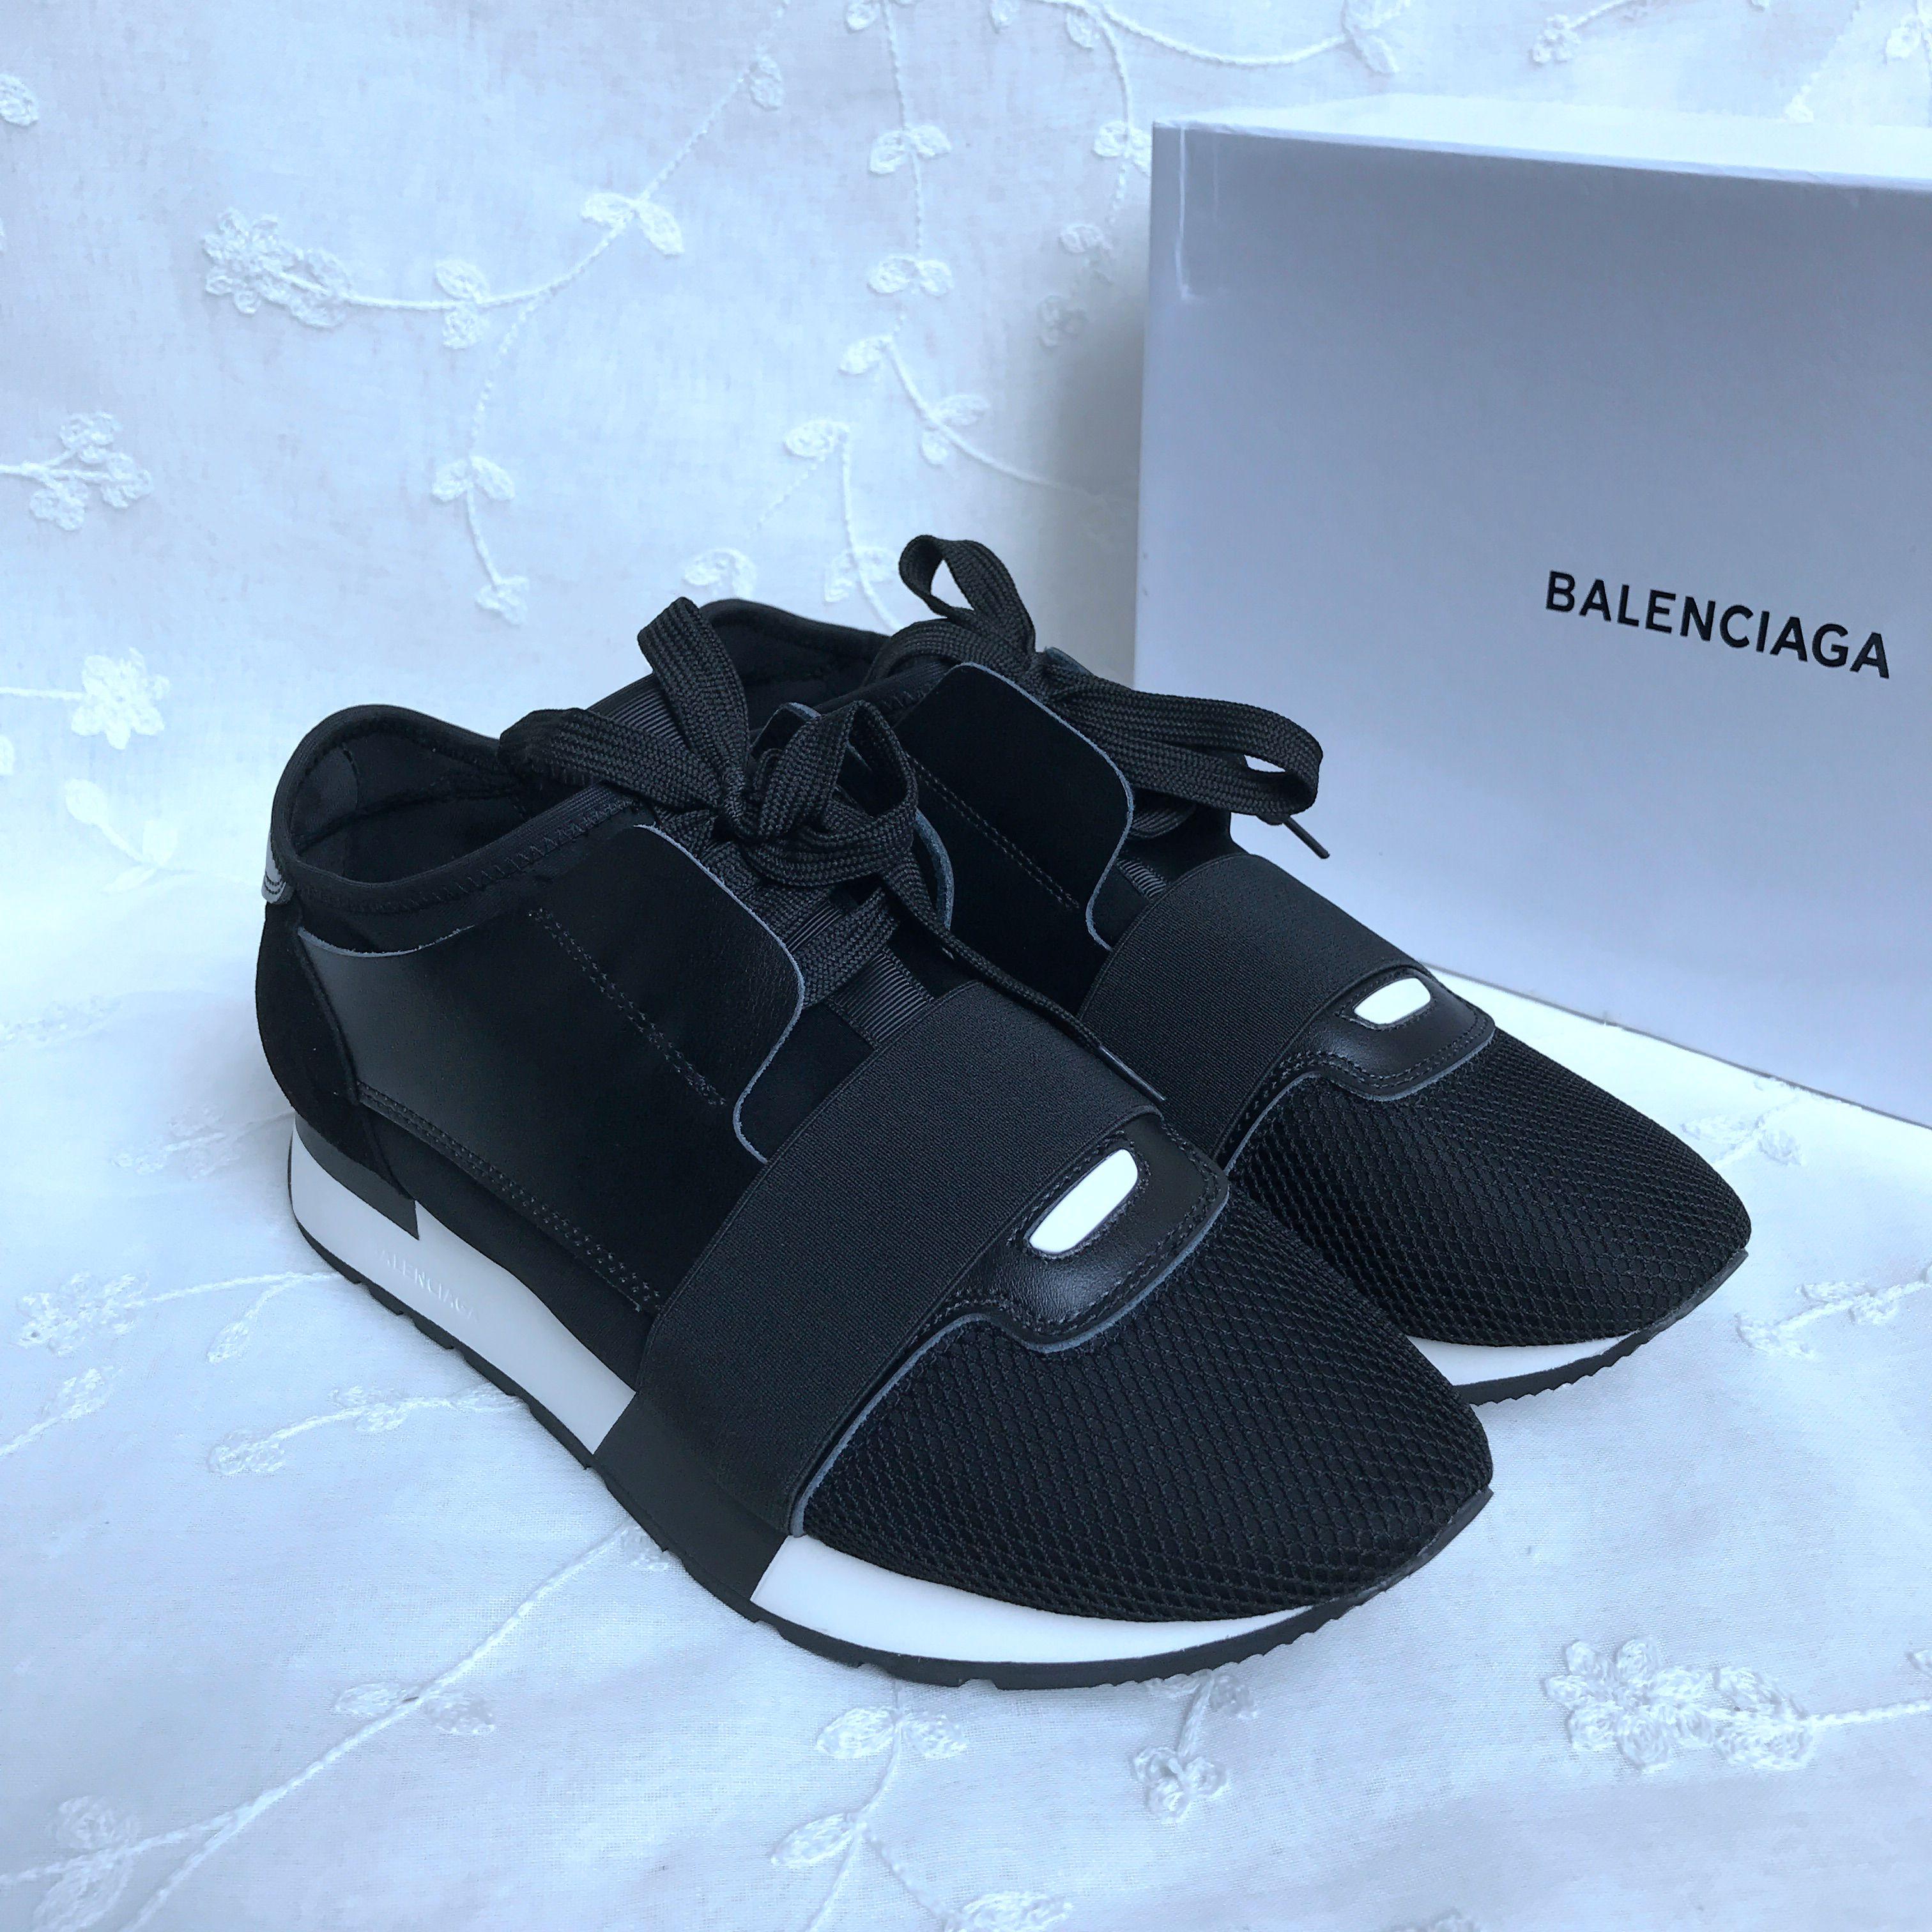 Balenciage Casual Shoes 438799